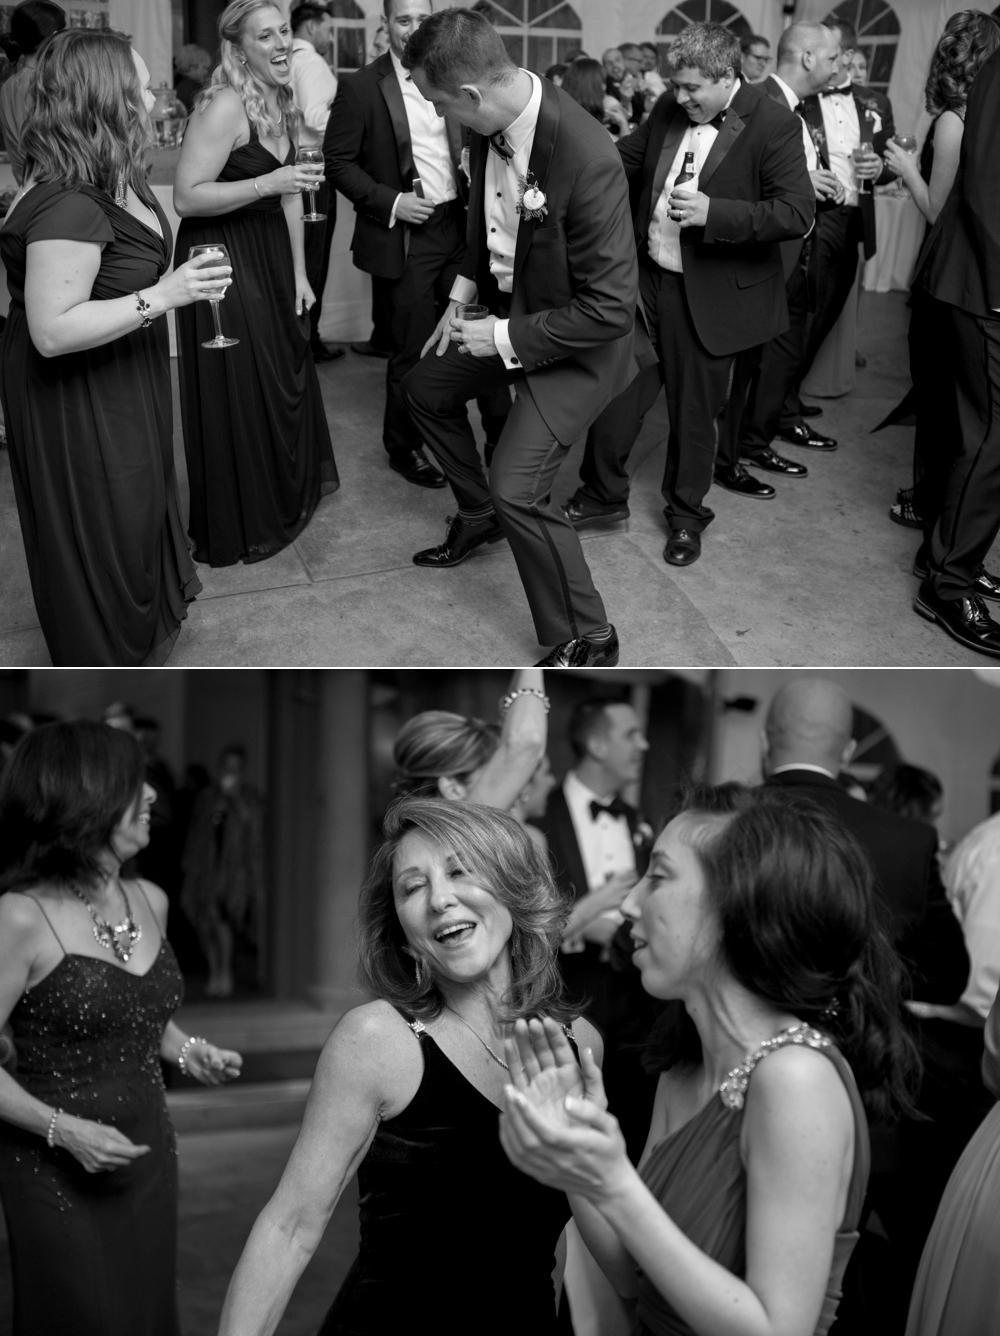 EoilaMansion_Wedding_Leah&Tom_0053.jpg